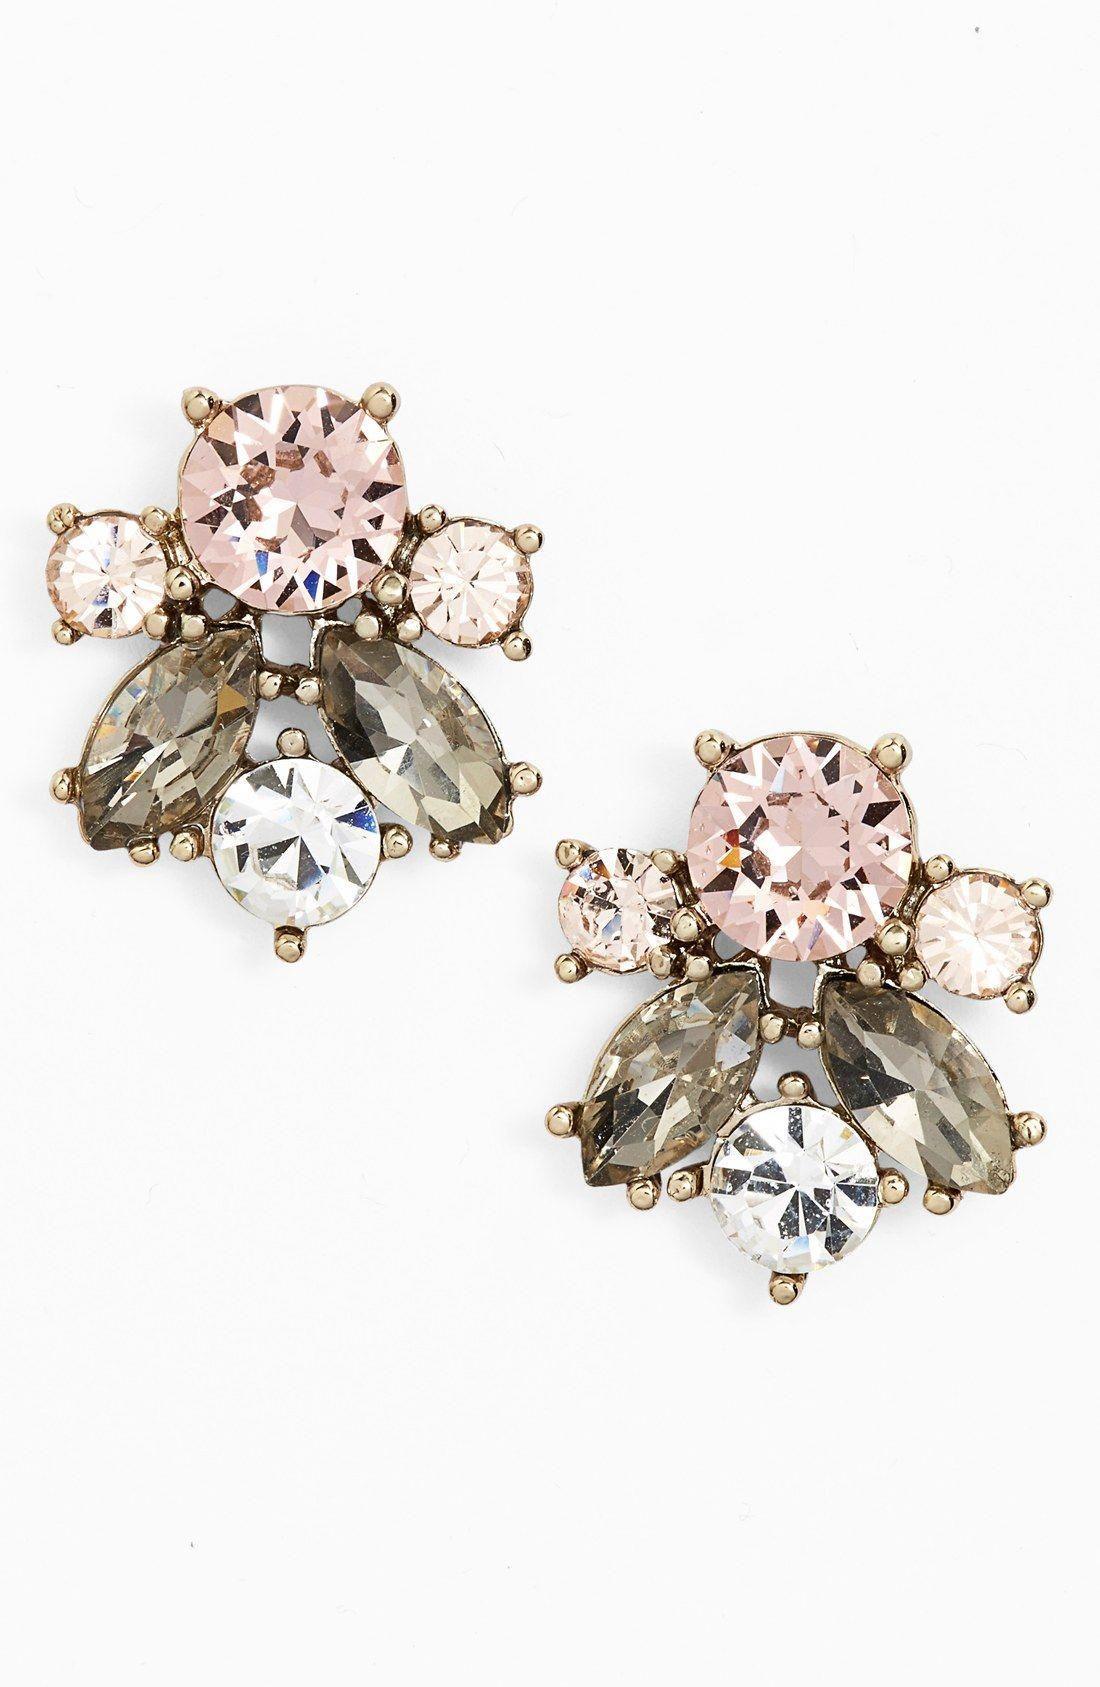 To clean diamond jewelry, create an option using warm